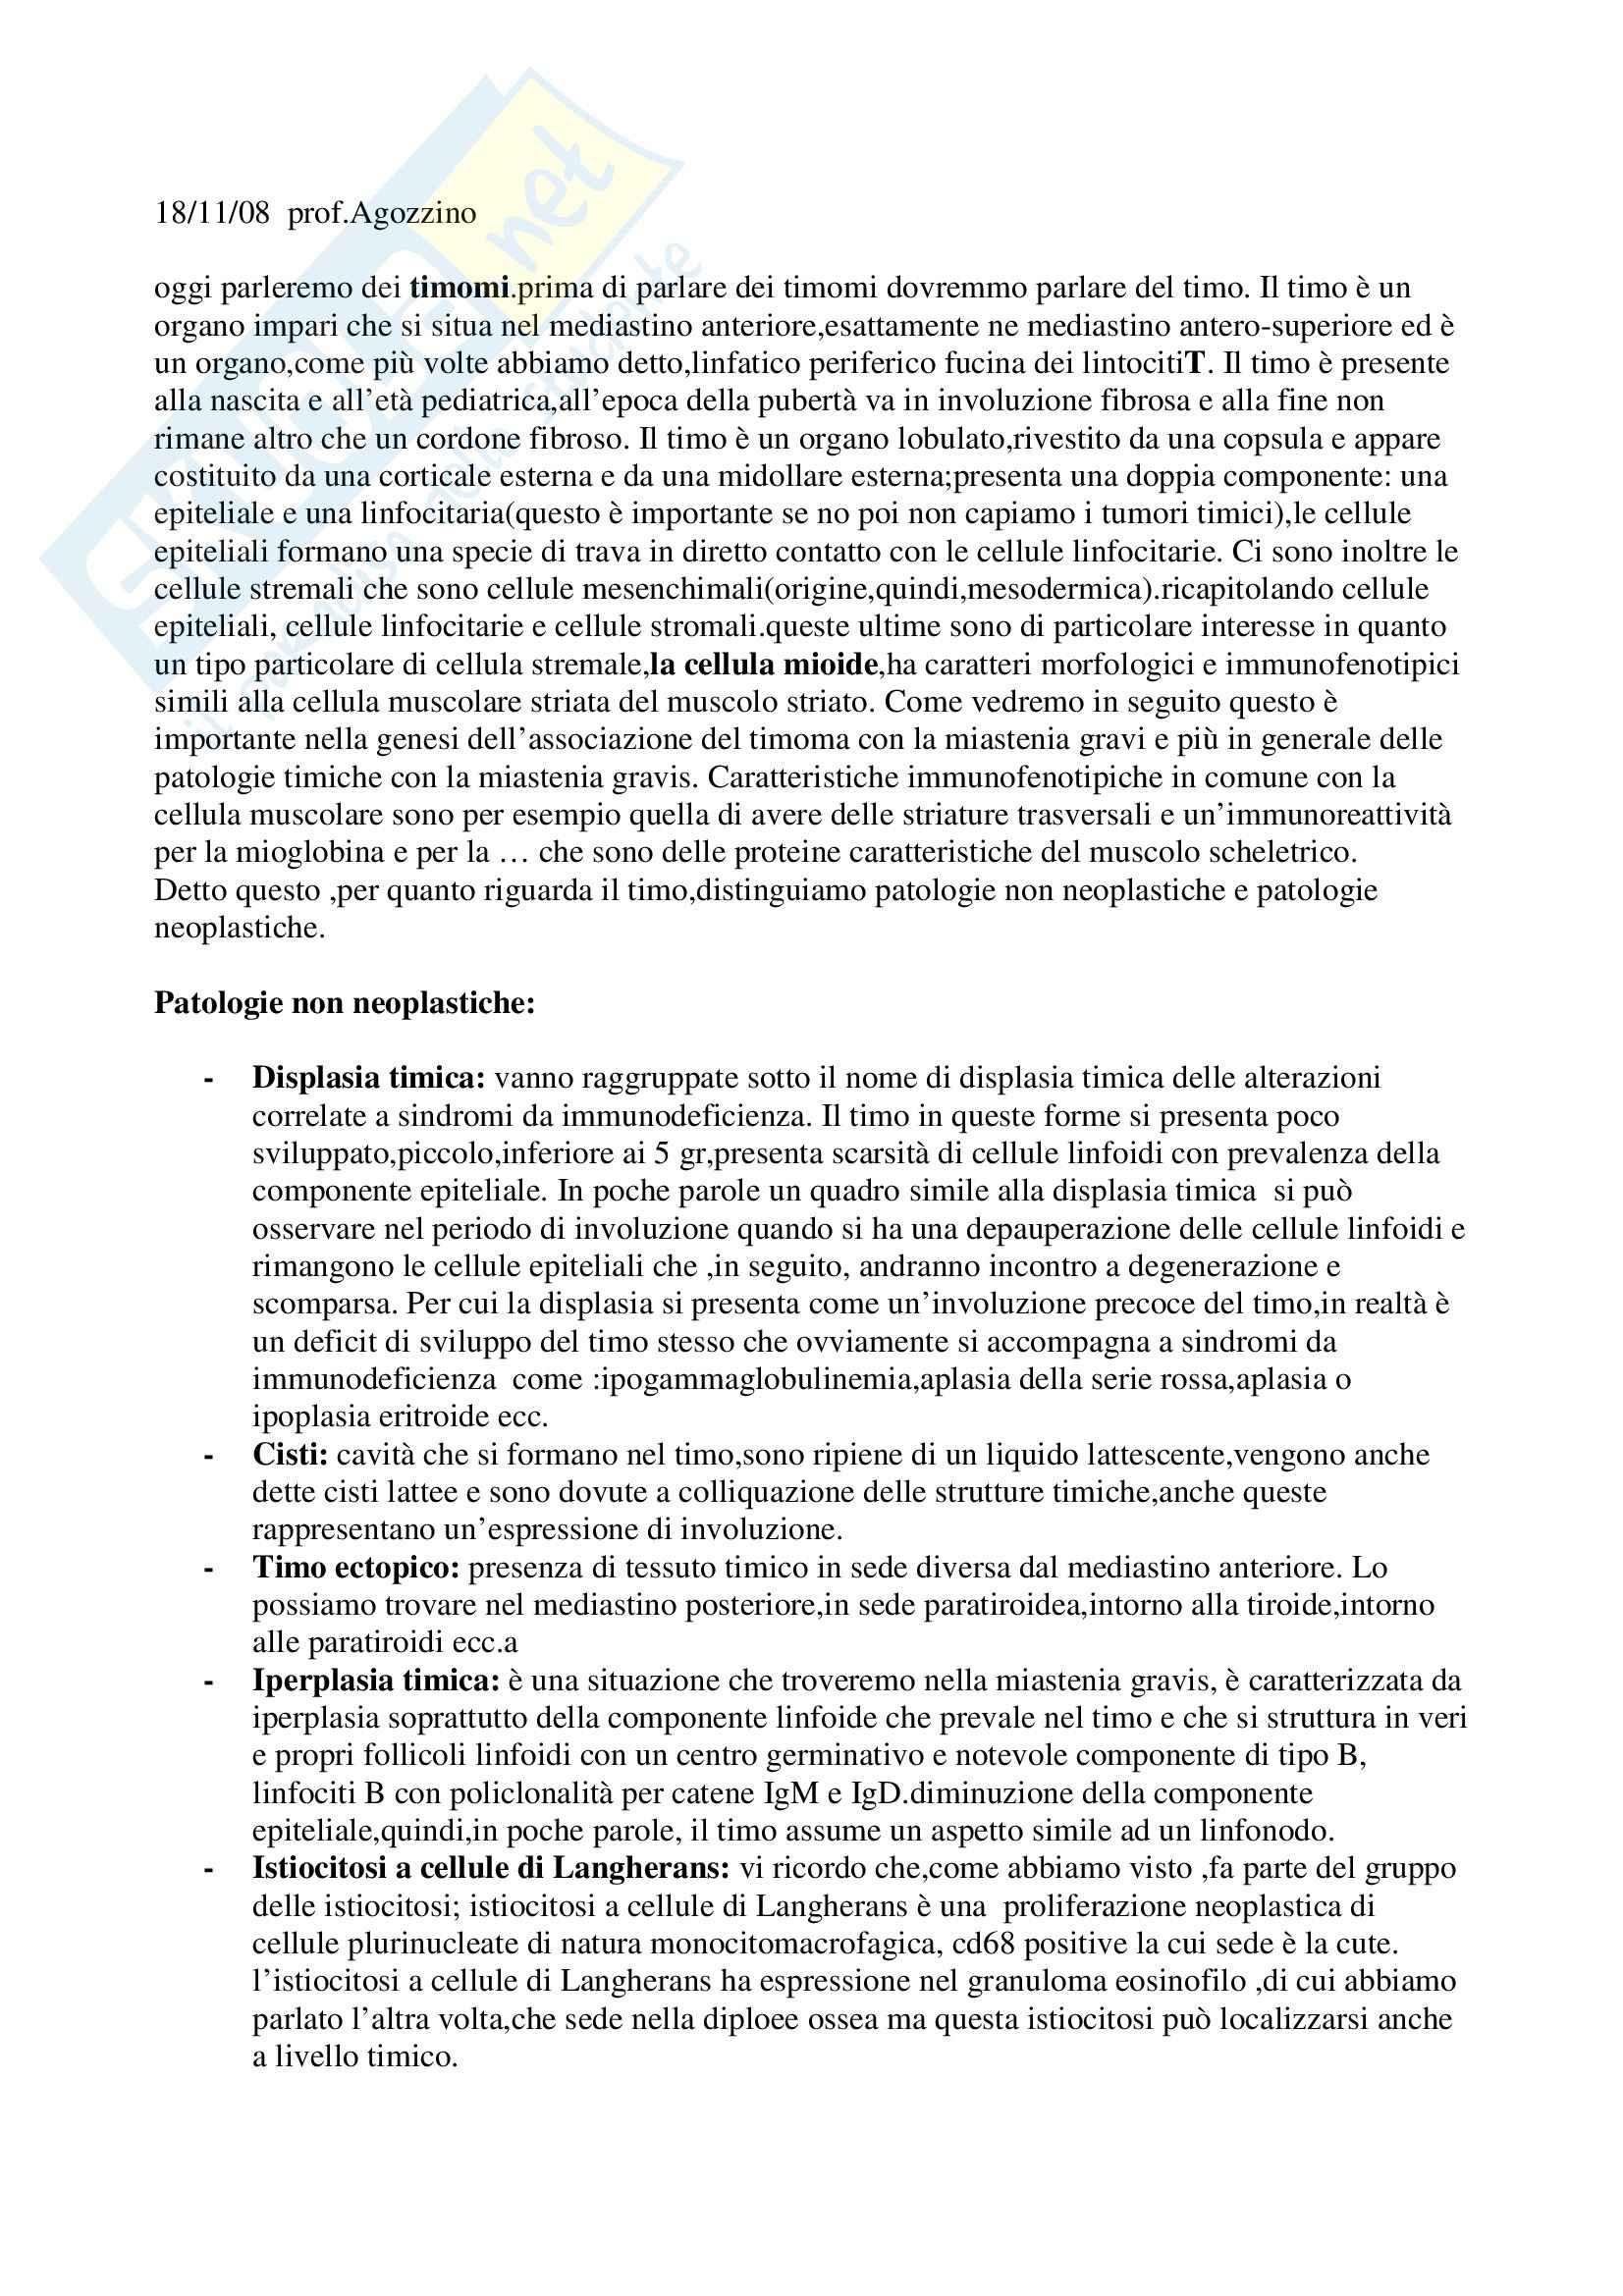 Anatomia patologica - timomi